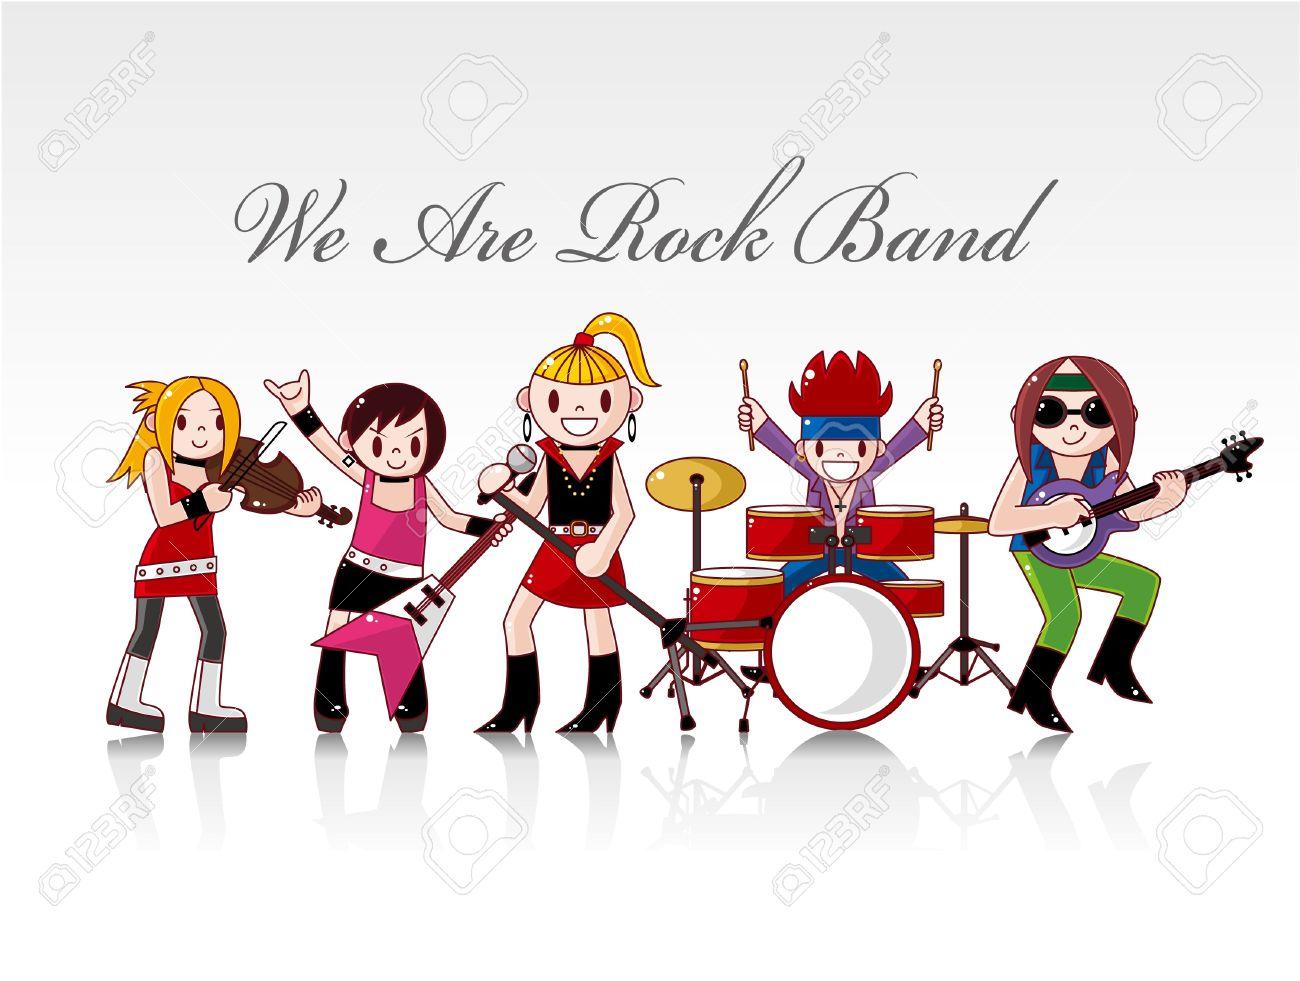 rock band card royalty free cliparts vectors and stock rh 123rf com classic rock band clipart cartoon rock band clipart